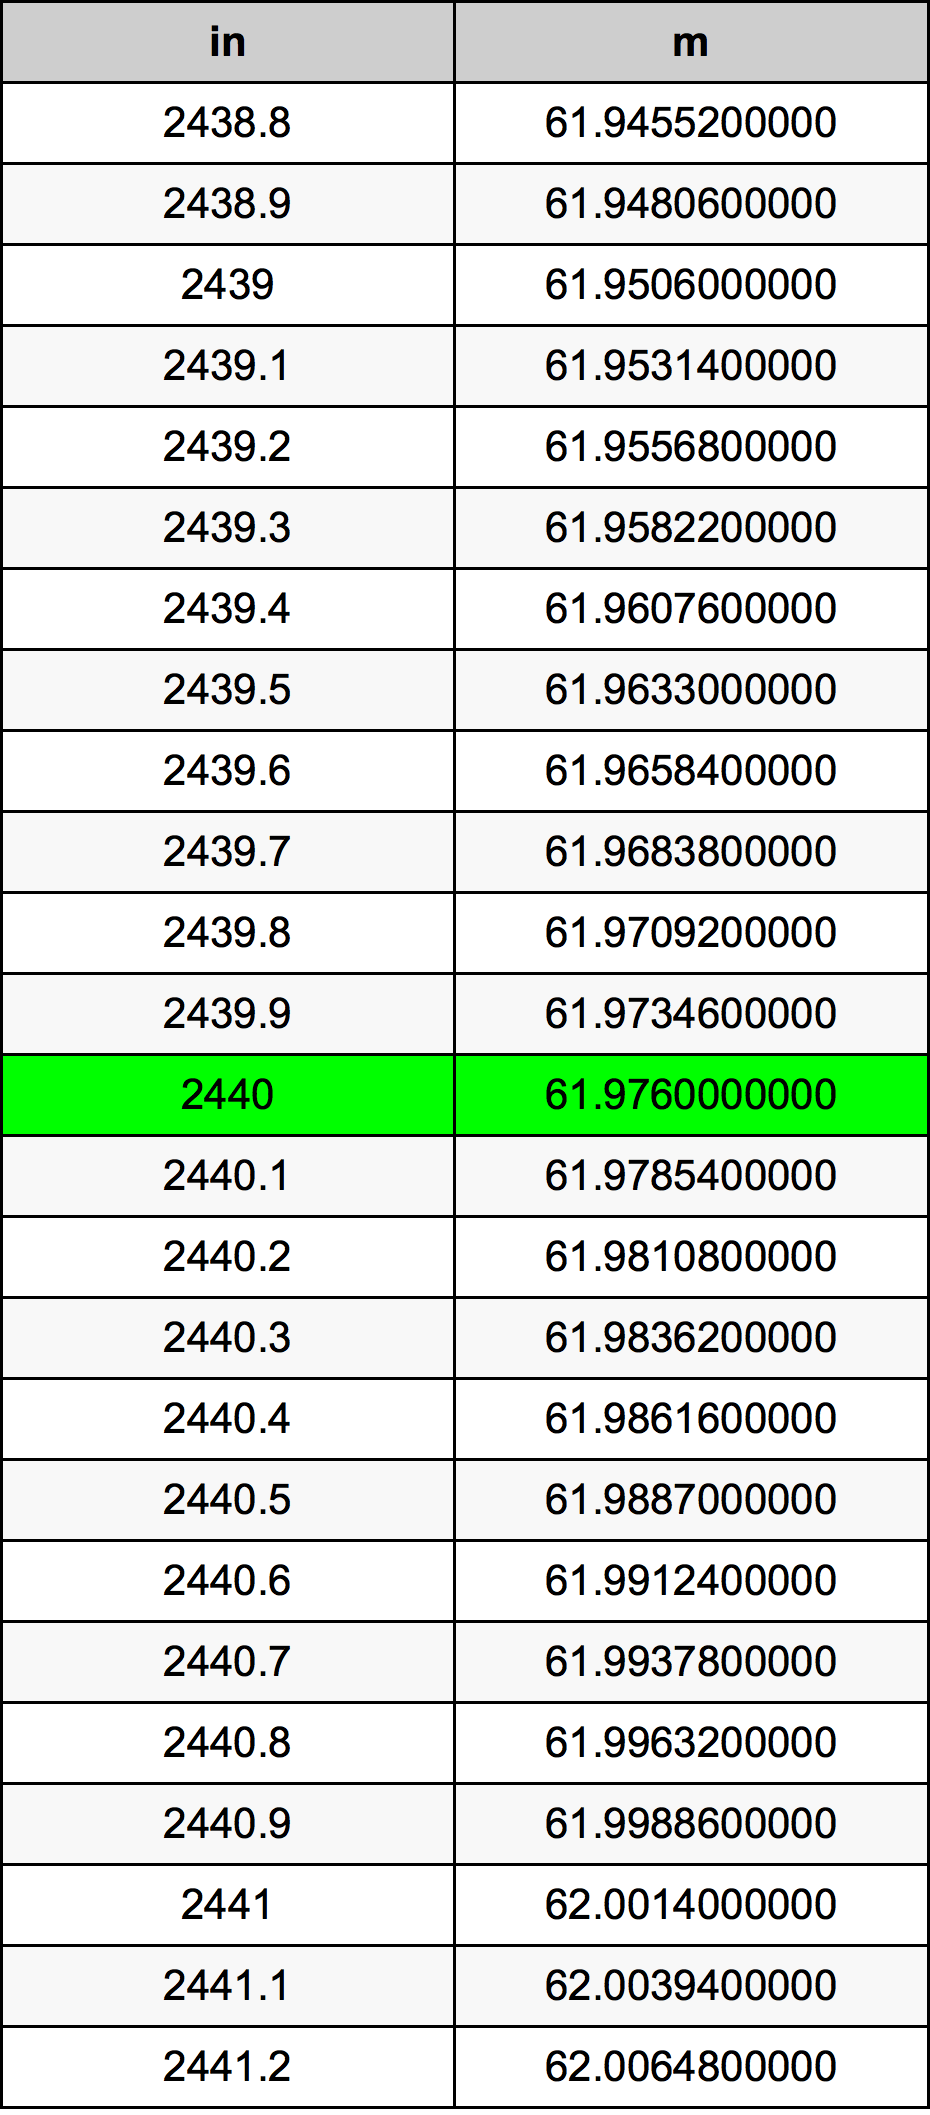 2440 इंच रूपांतरण सारणी